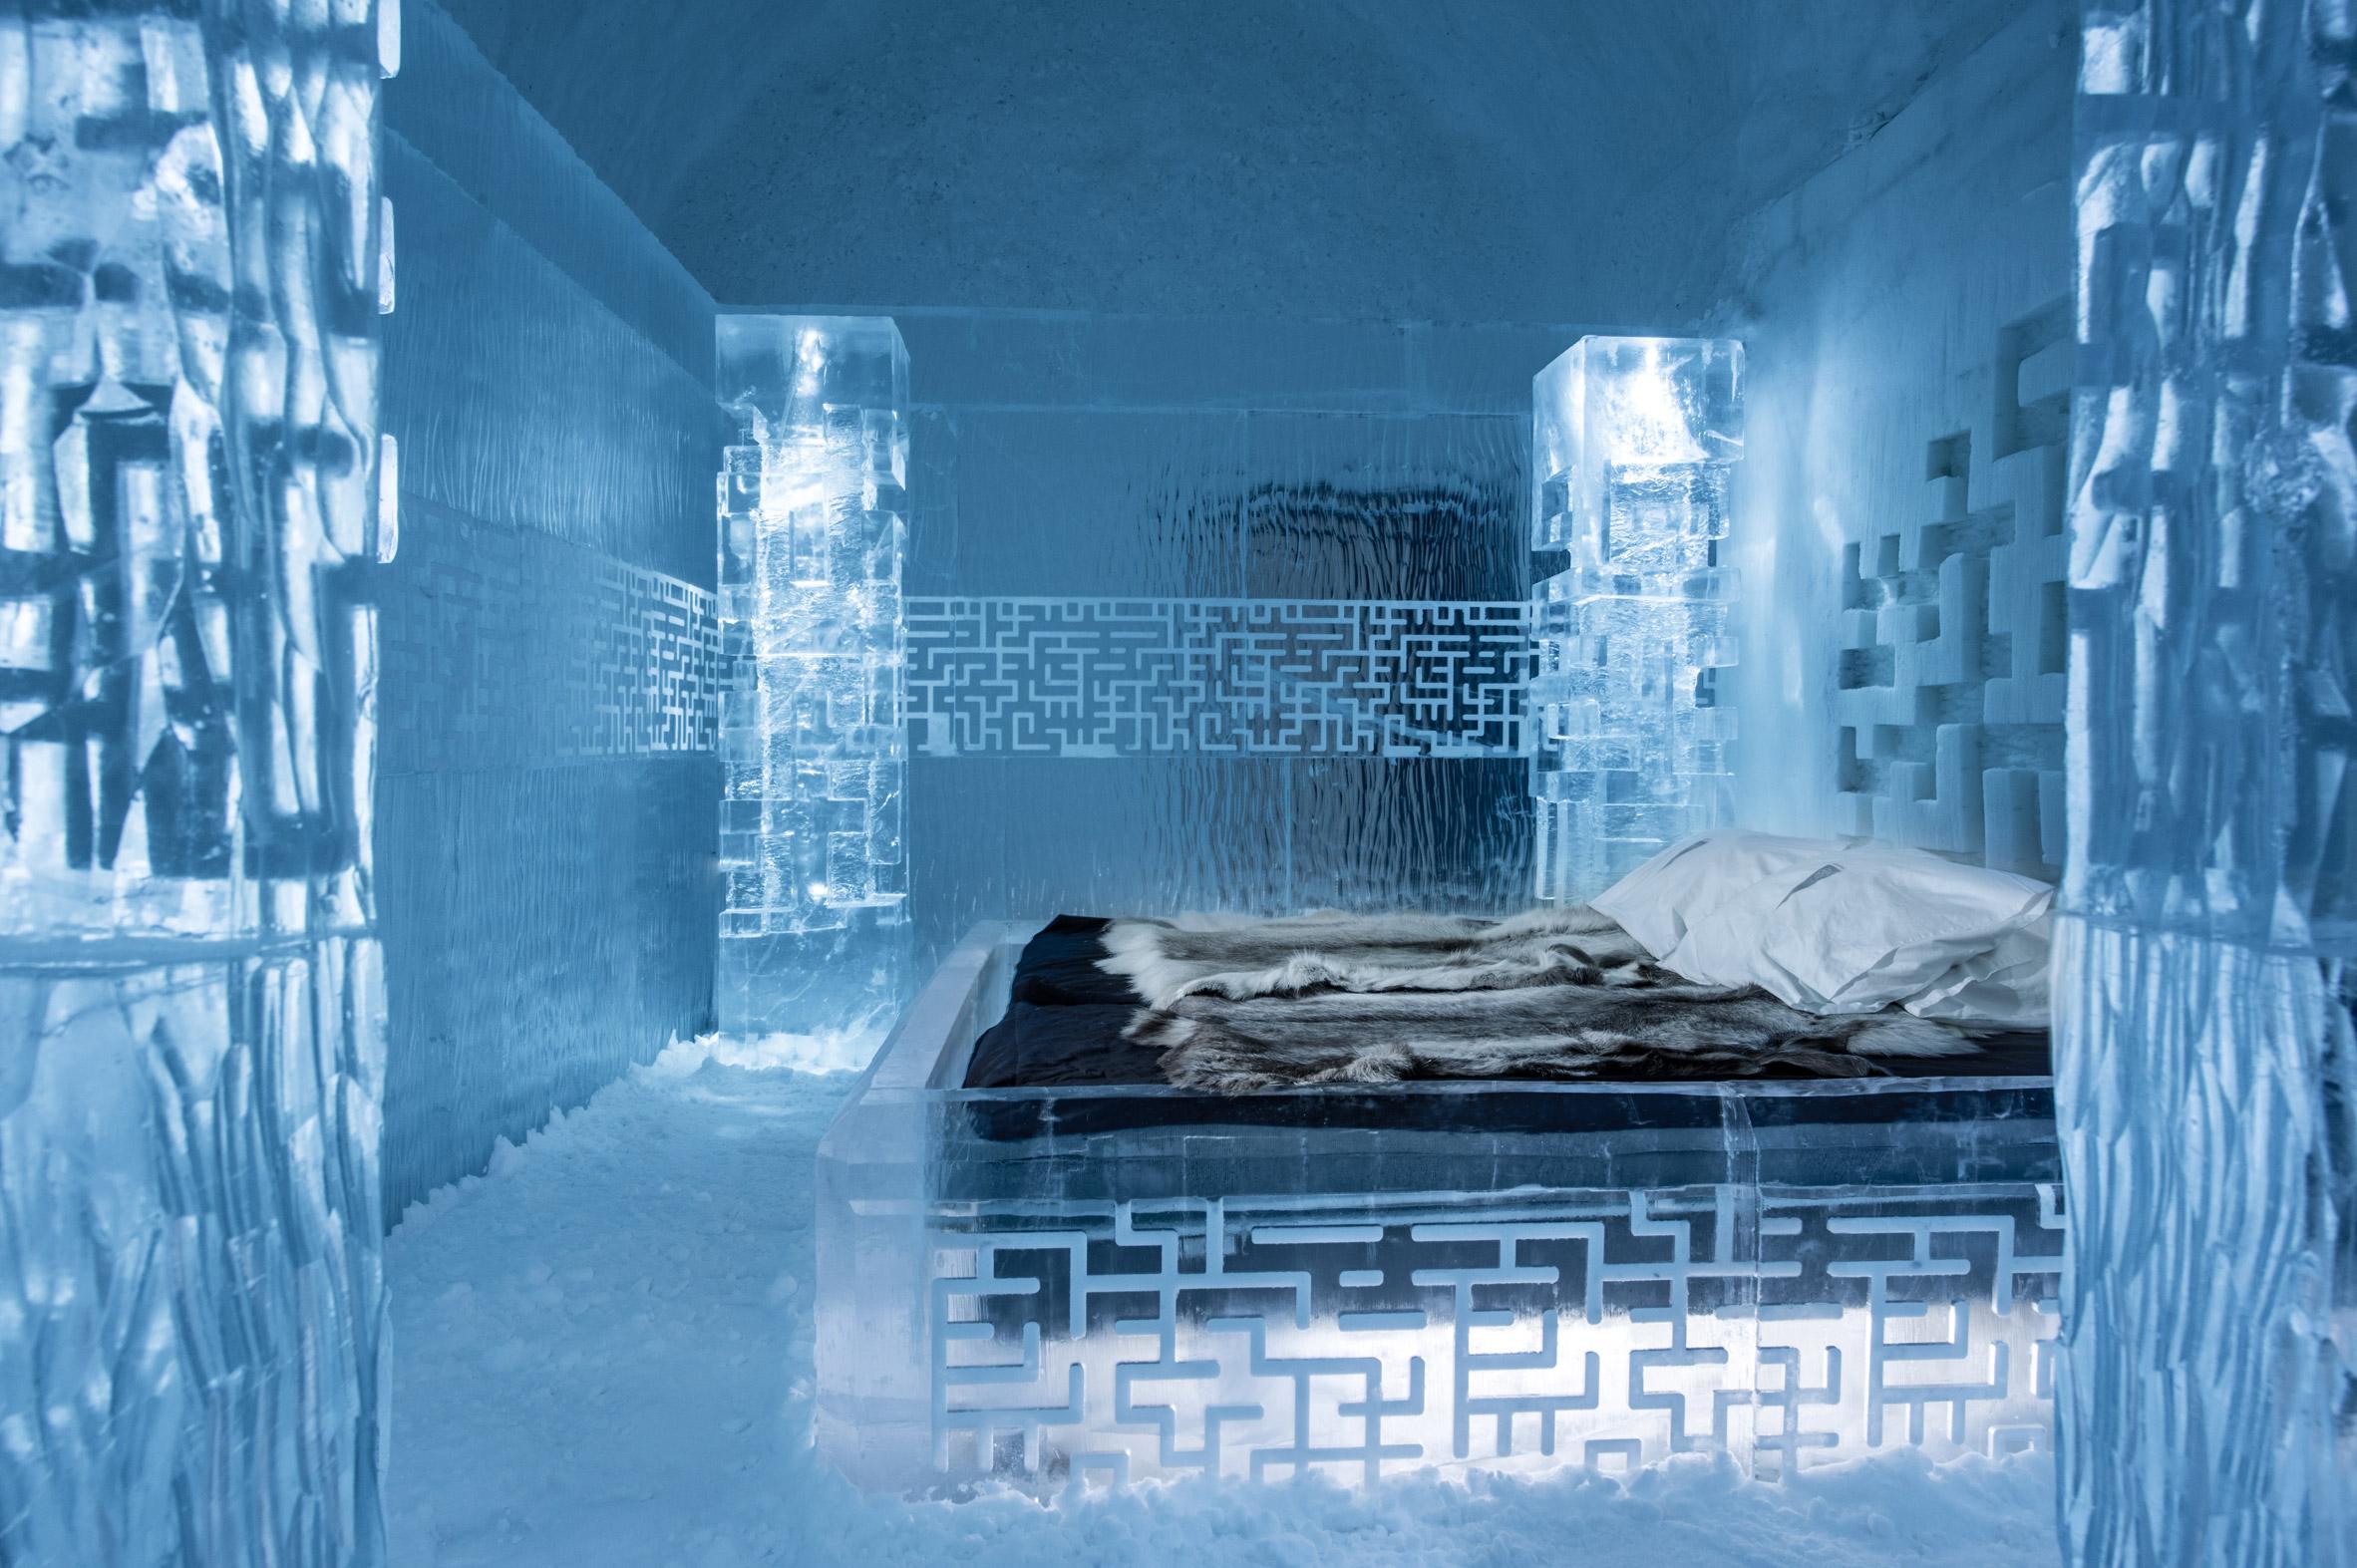 ice-hotel-365-discover-the-world-jukkasjarvi-interior_dezeen_2364_col_4